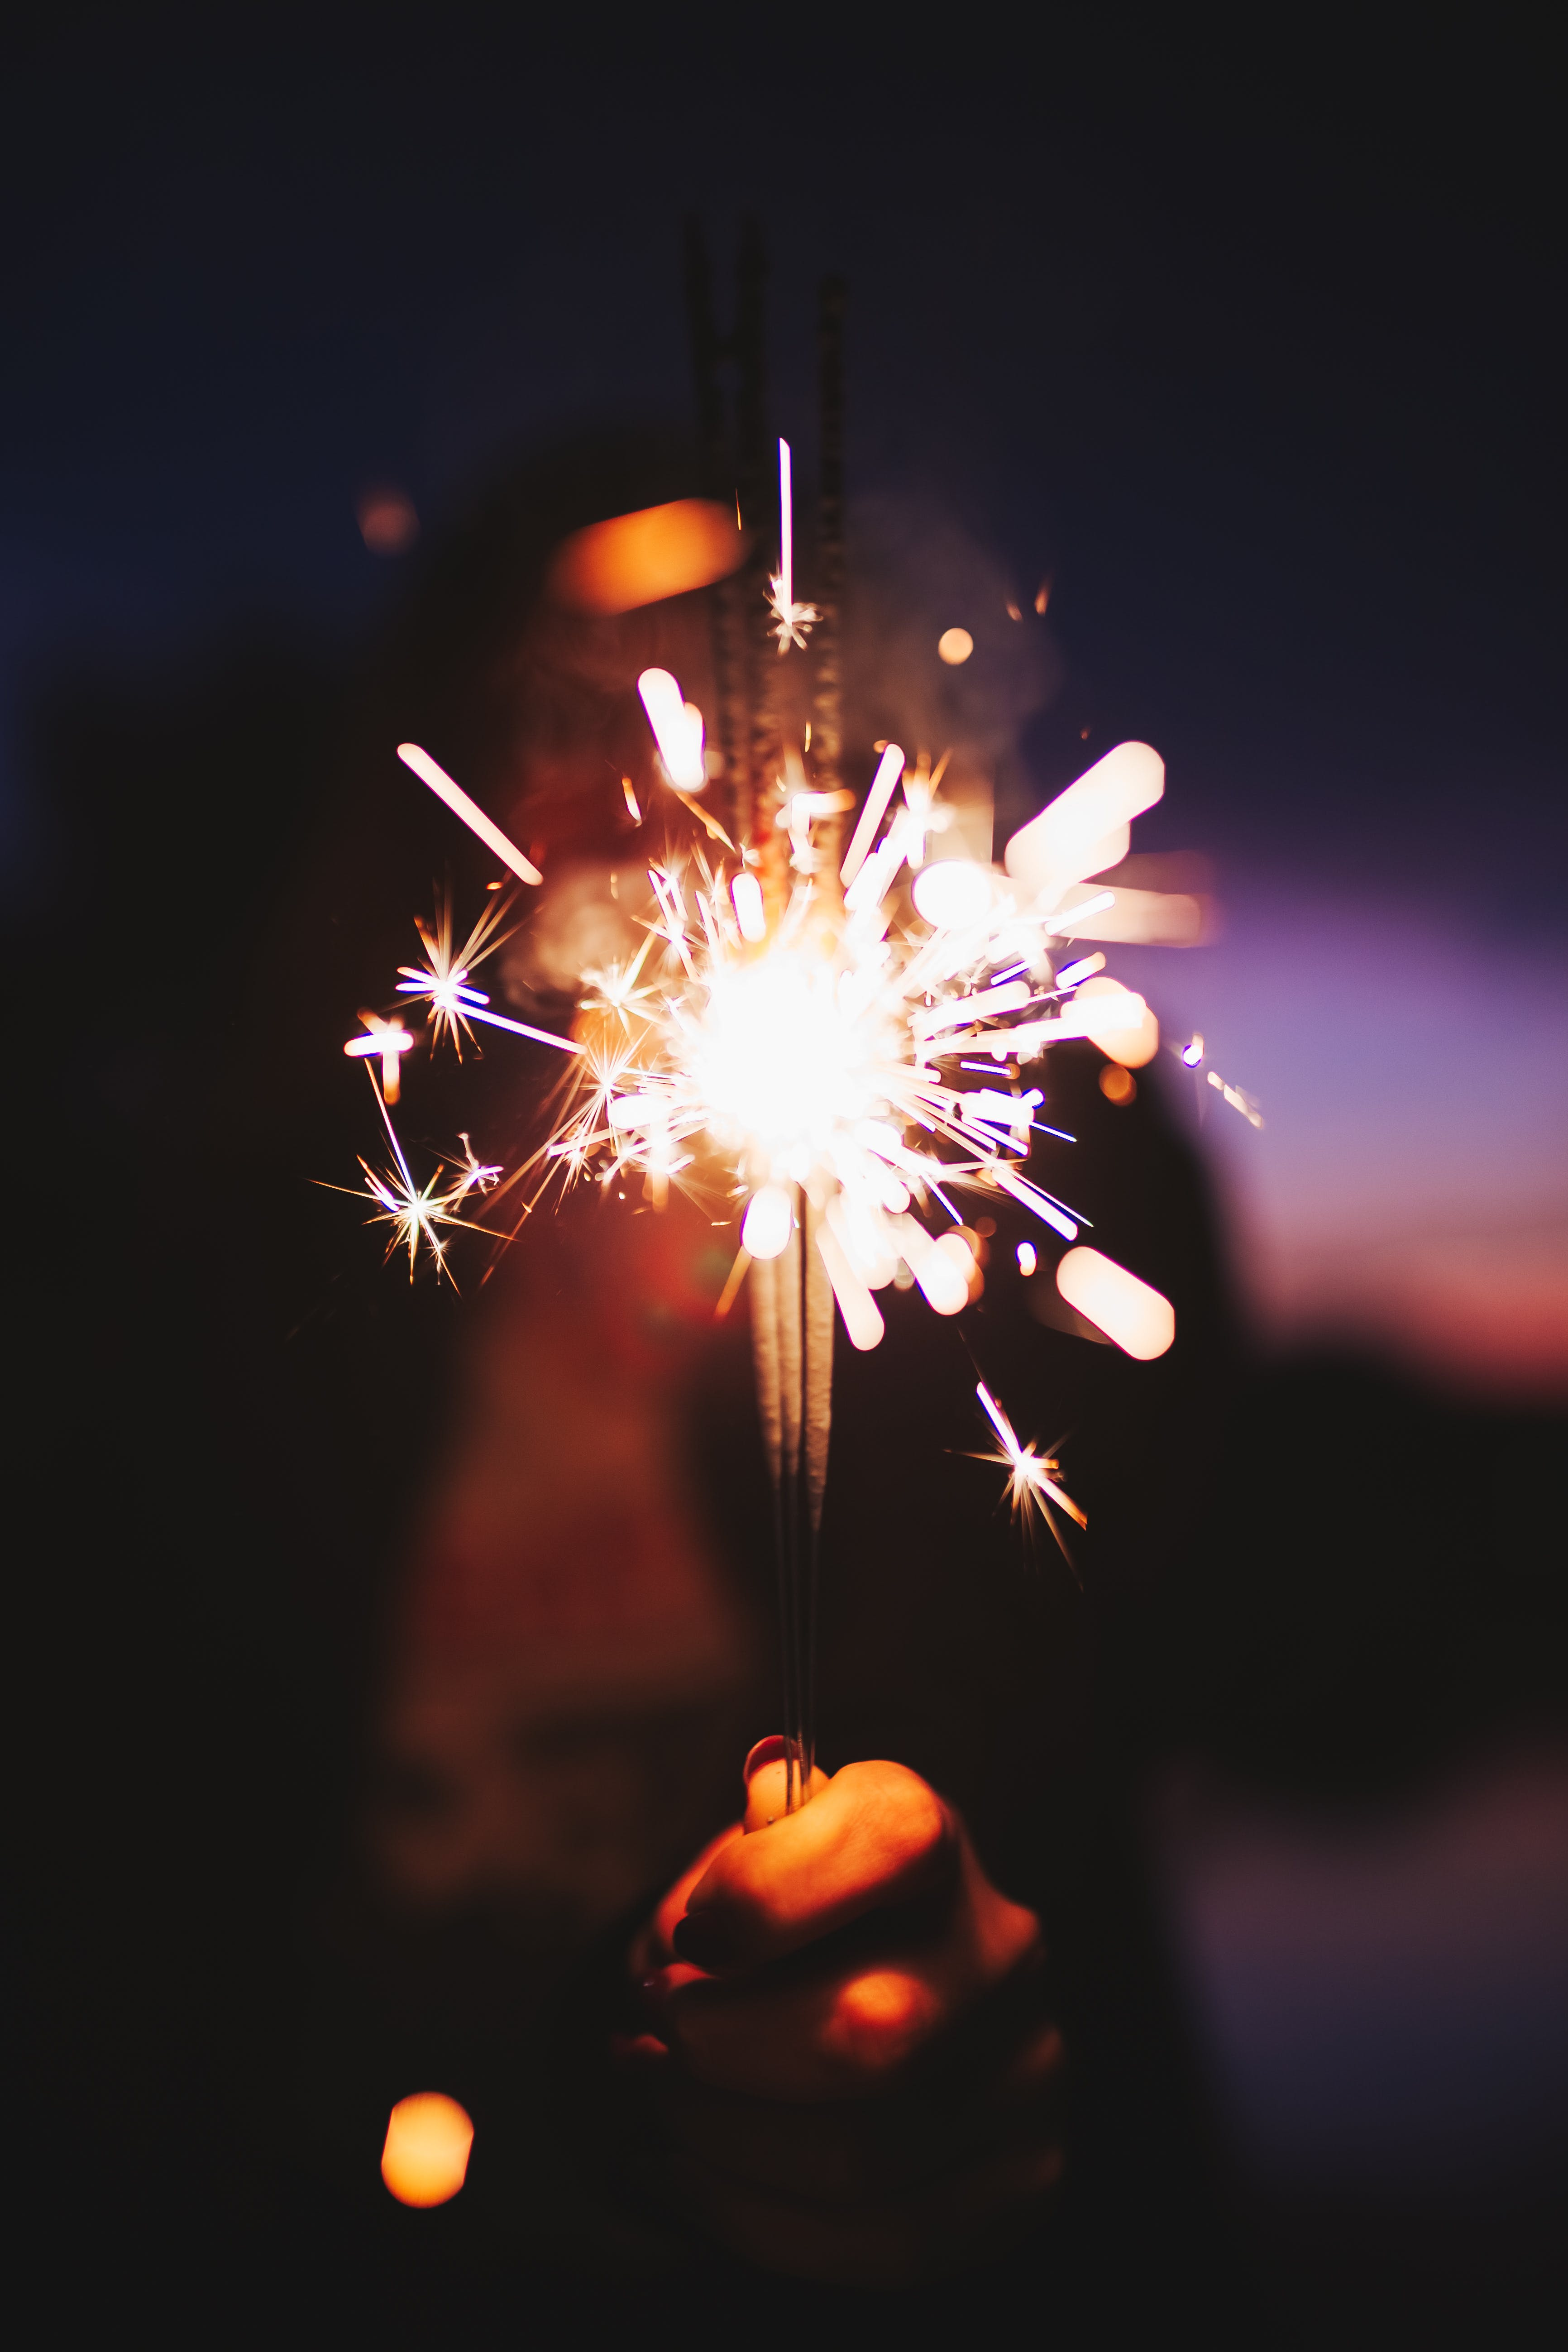 Free stock photo of lights, festive, blur, bokeh